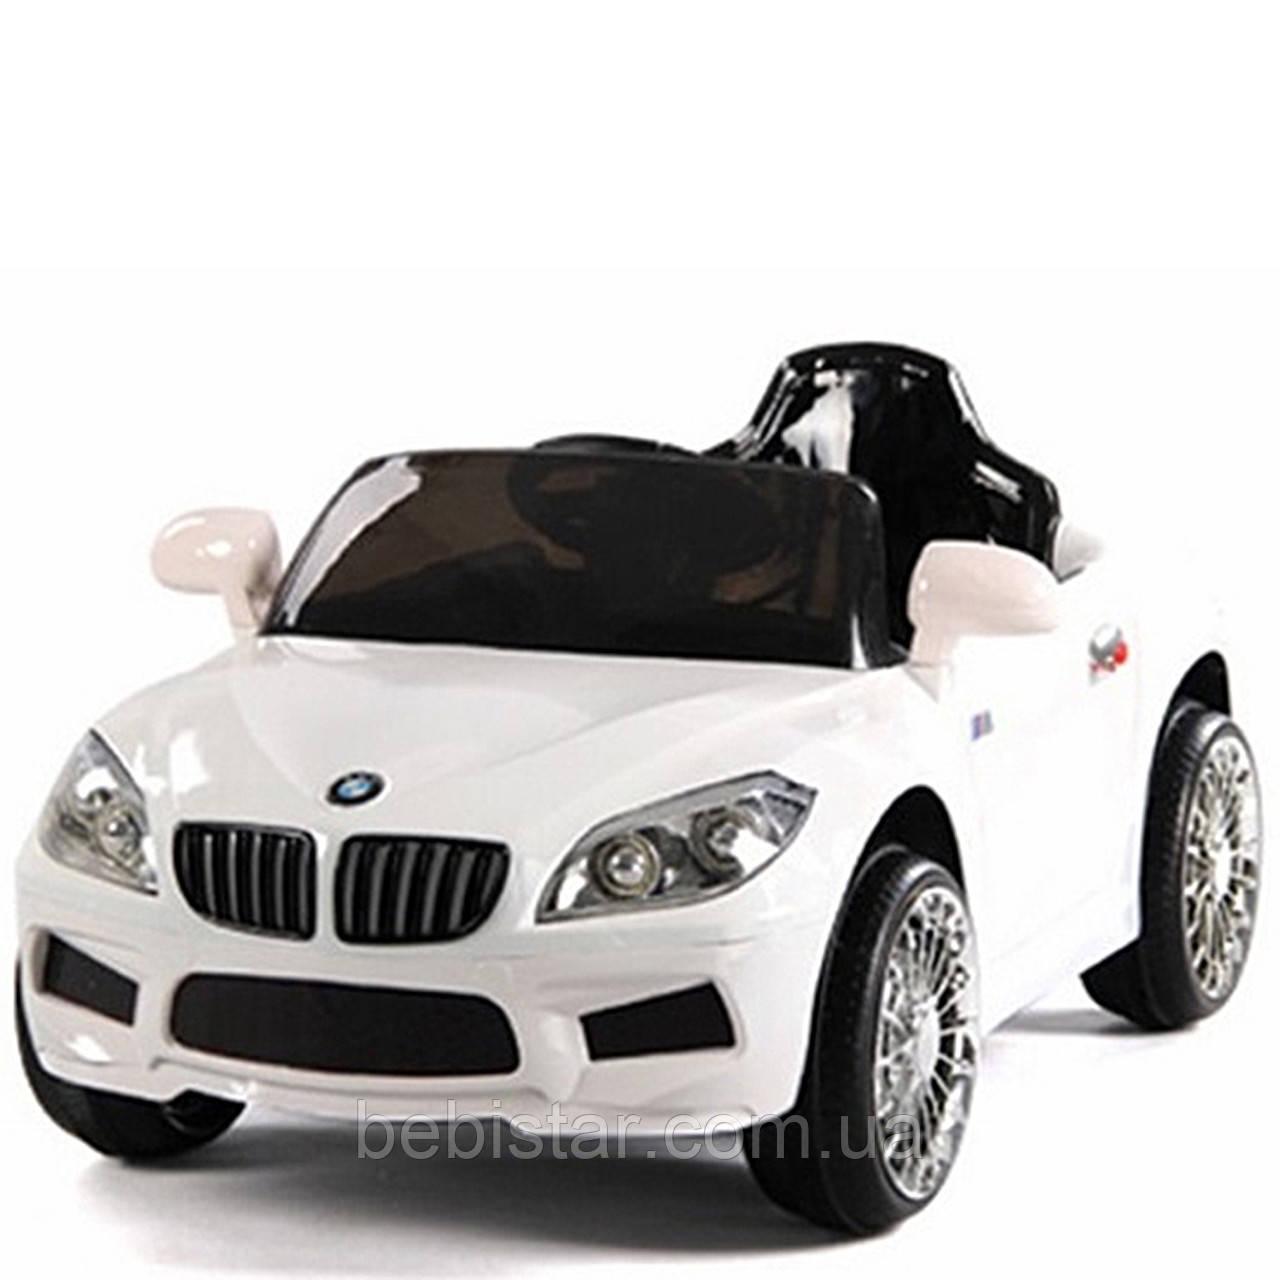 Электромобиль белый T-764 WHITE для деток 3-8 лет с пультом мотор 1*20W аккумулятор 6V4.5AH